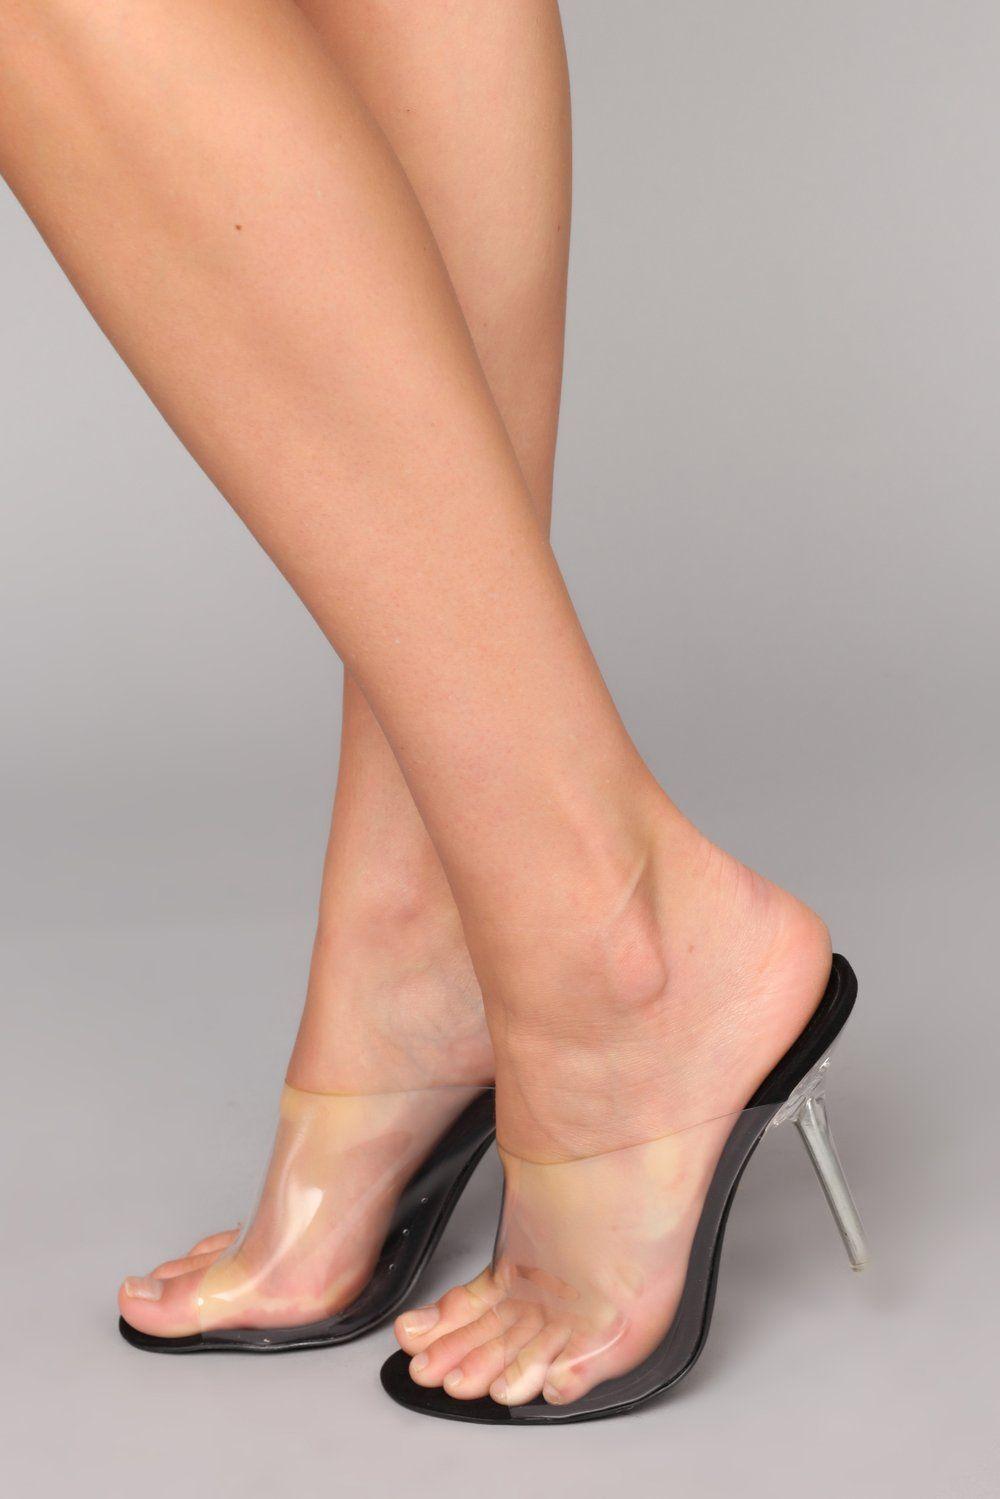 b0203bef7e3 The Glass Slide - Black in 2019   mules   Heels, Stiletto heels ...